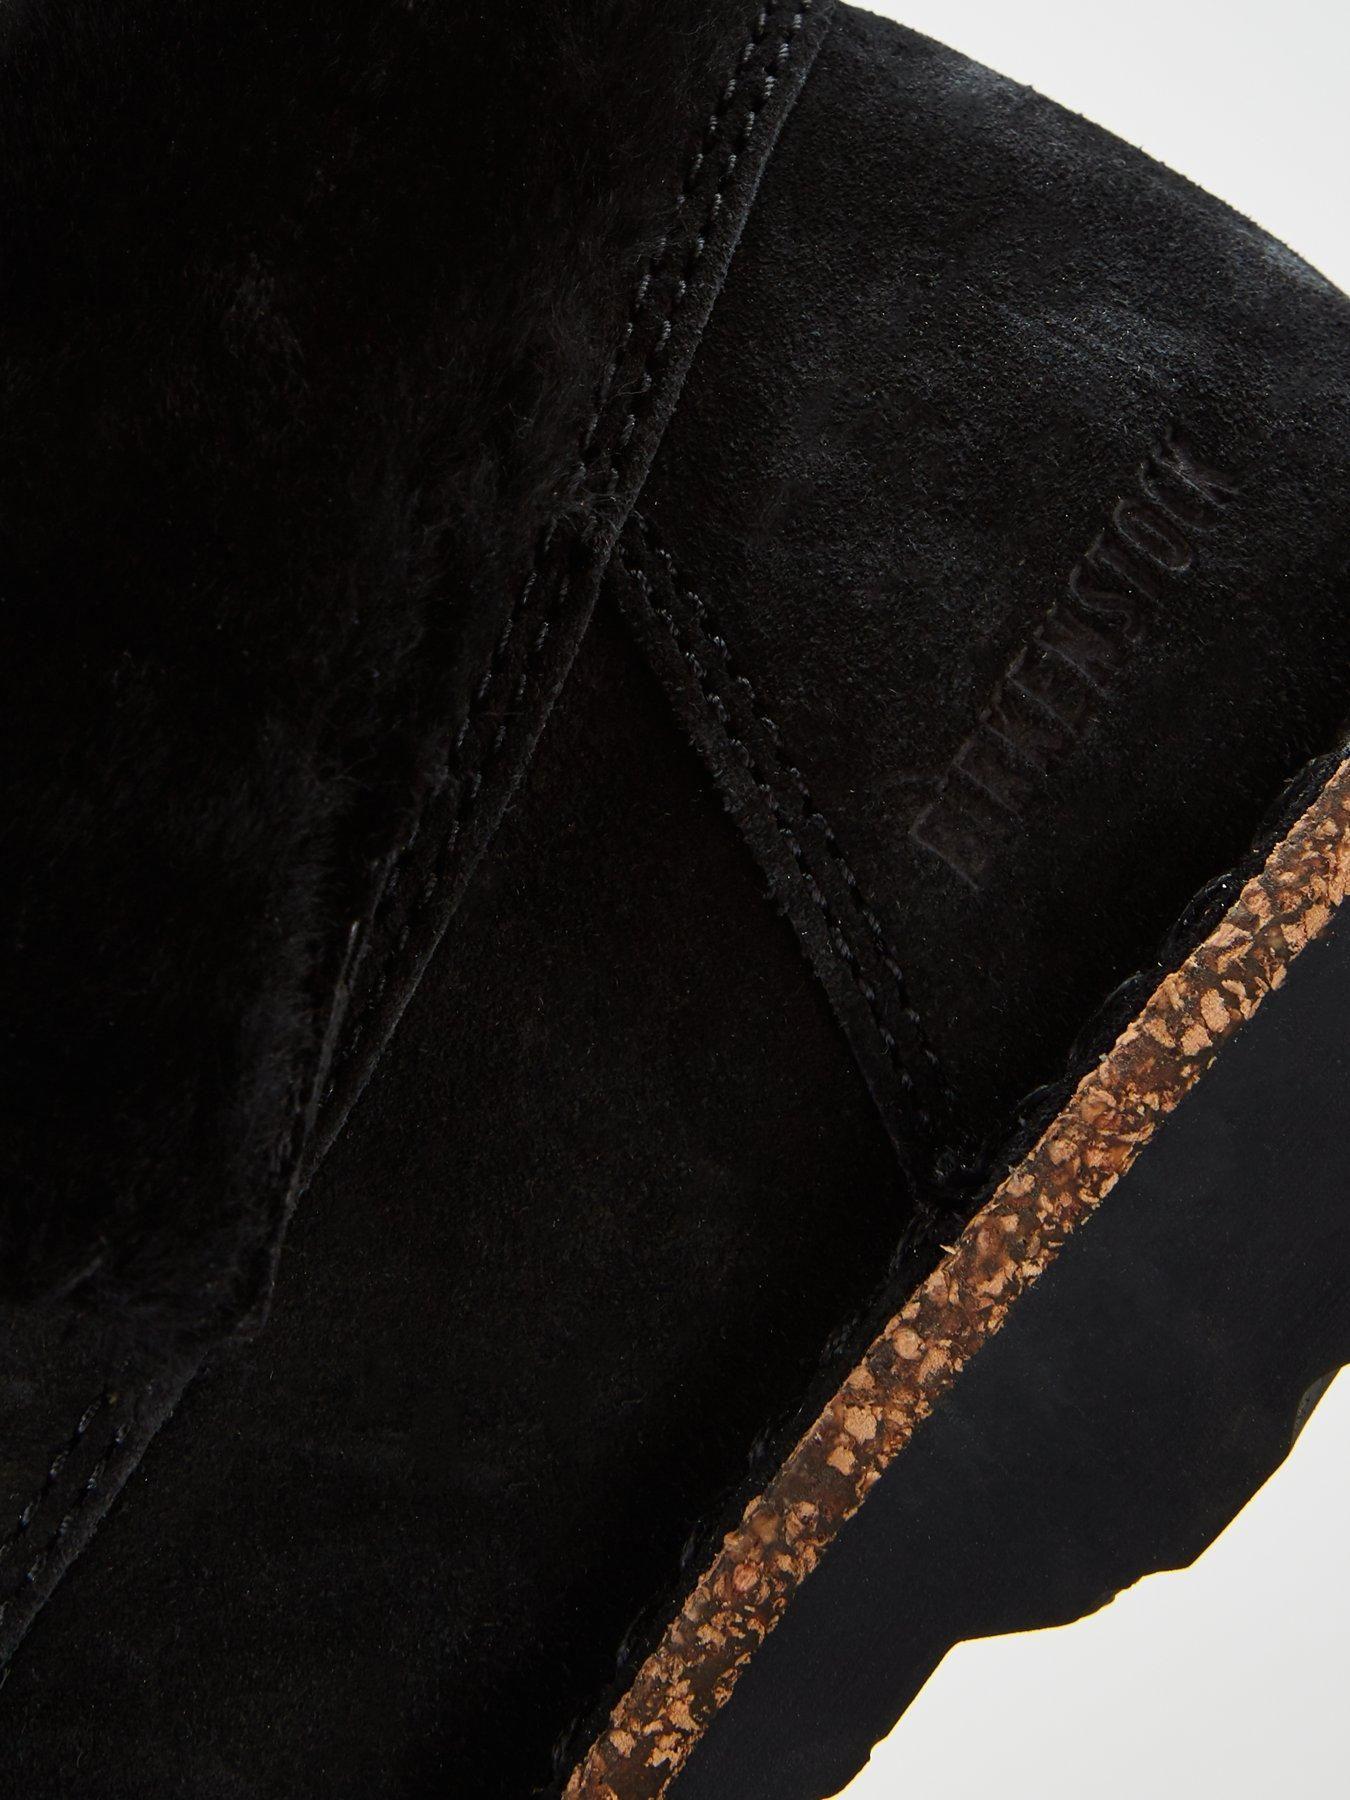 Birkenstock Birkenstock Bakki Ace Walk Narrow Ankle Boot